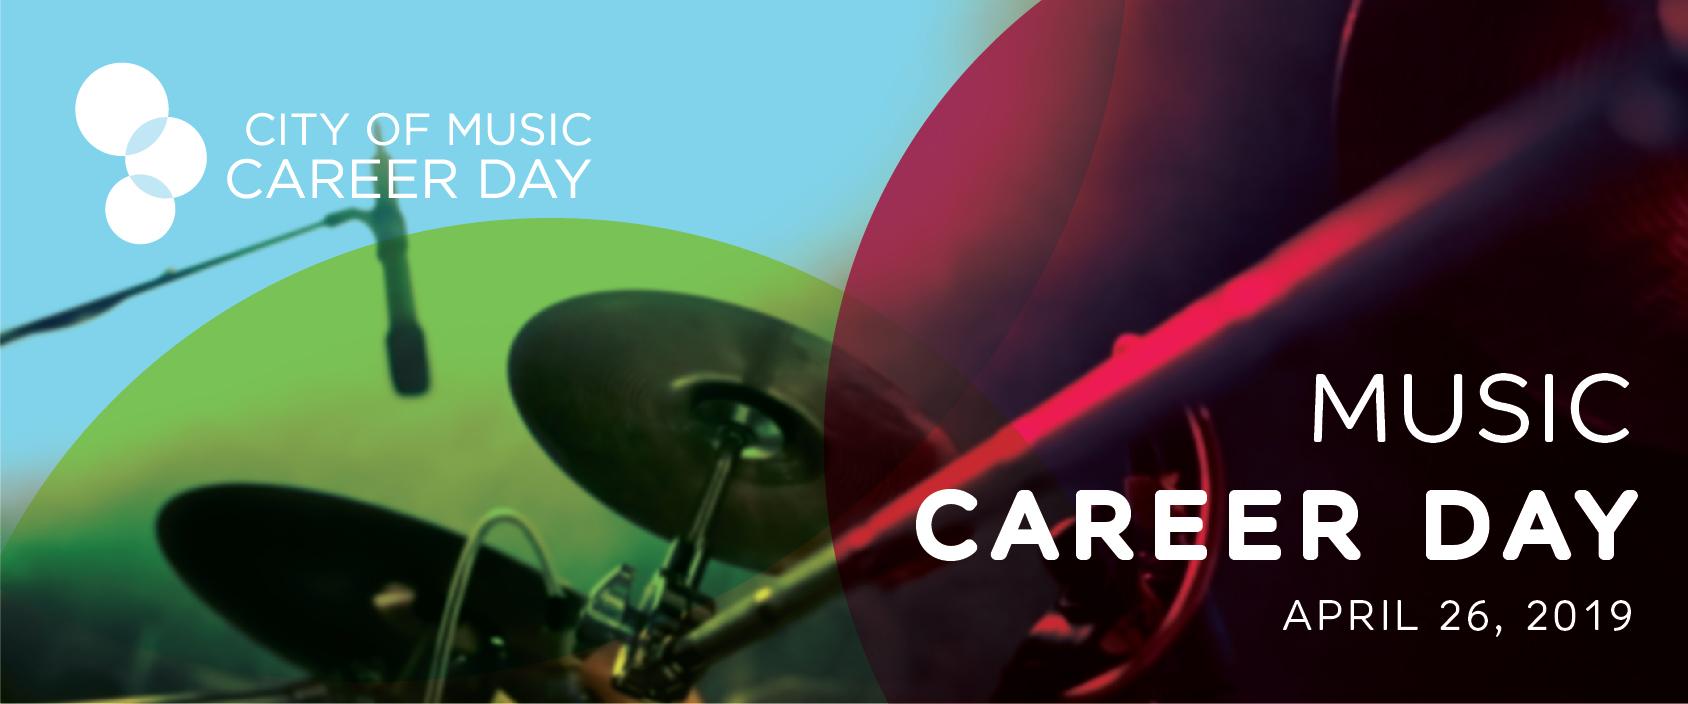 music_careerday_2019-logo-01.jpg